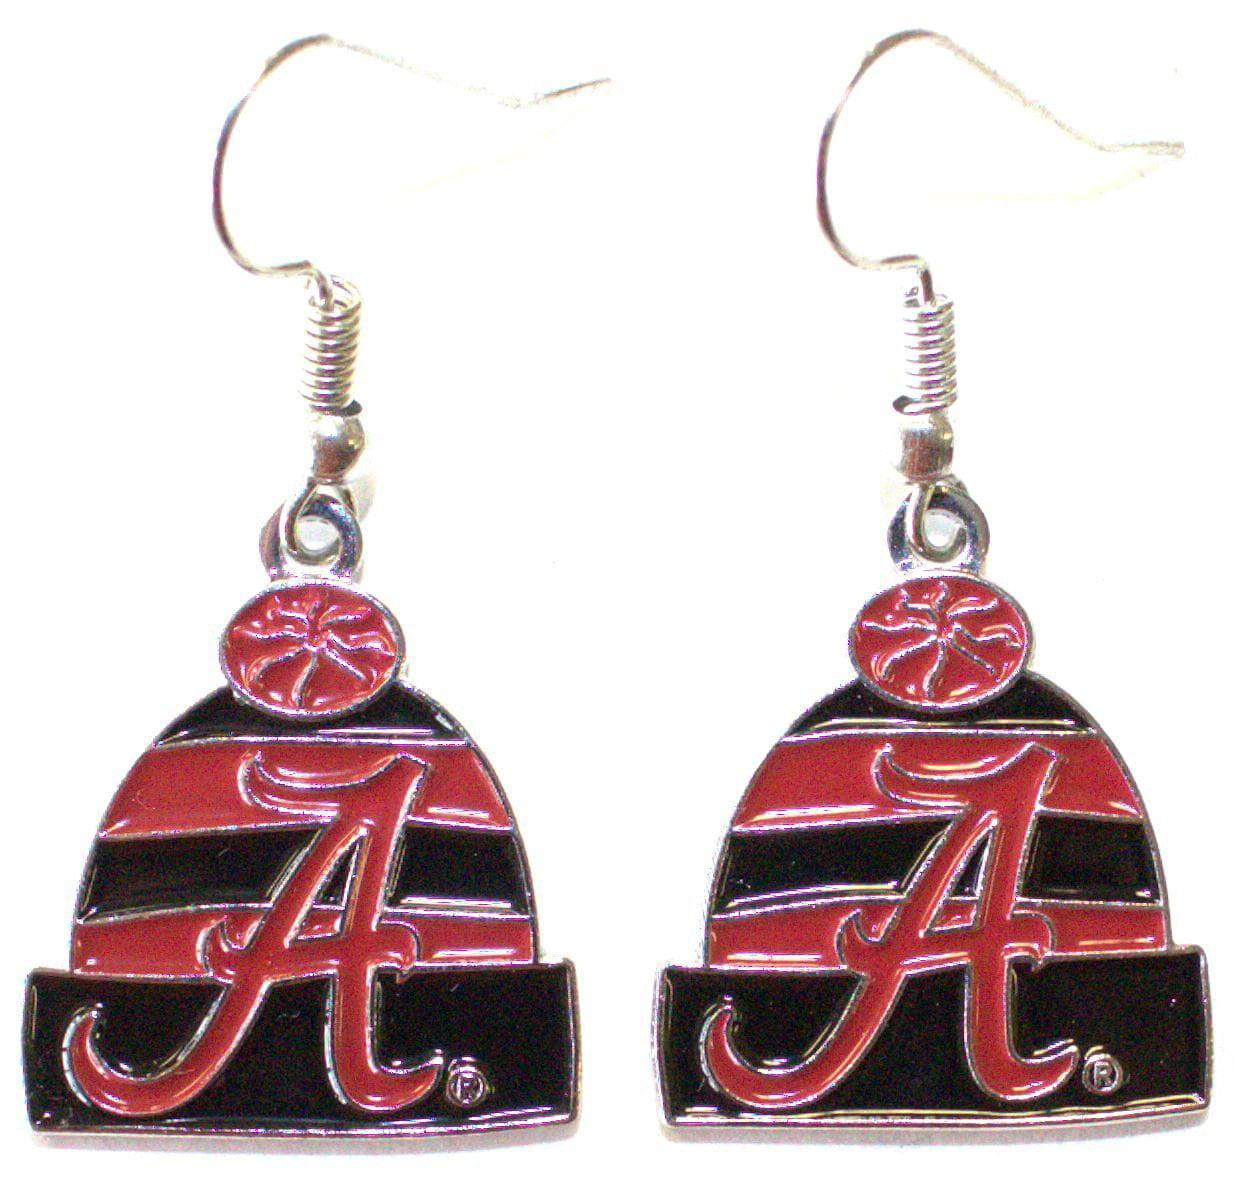 NCAA Officially Licensed Alabama Crimson Tide Beanie Style Dangle Earrings